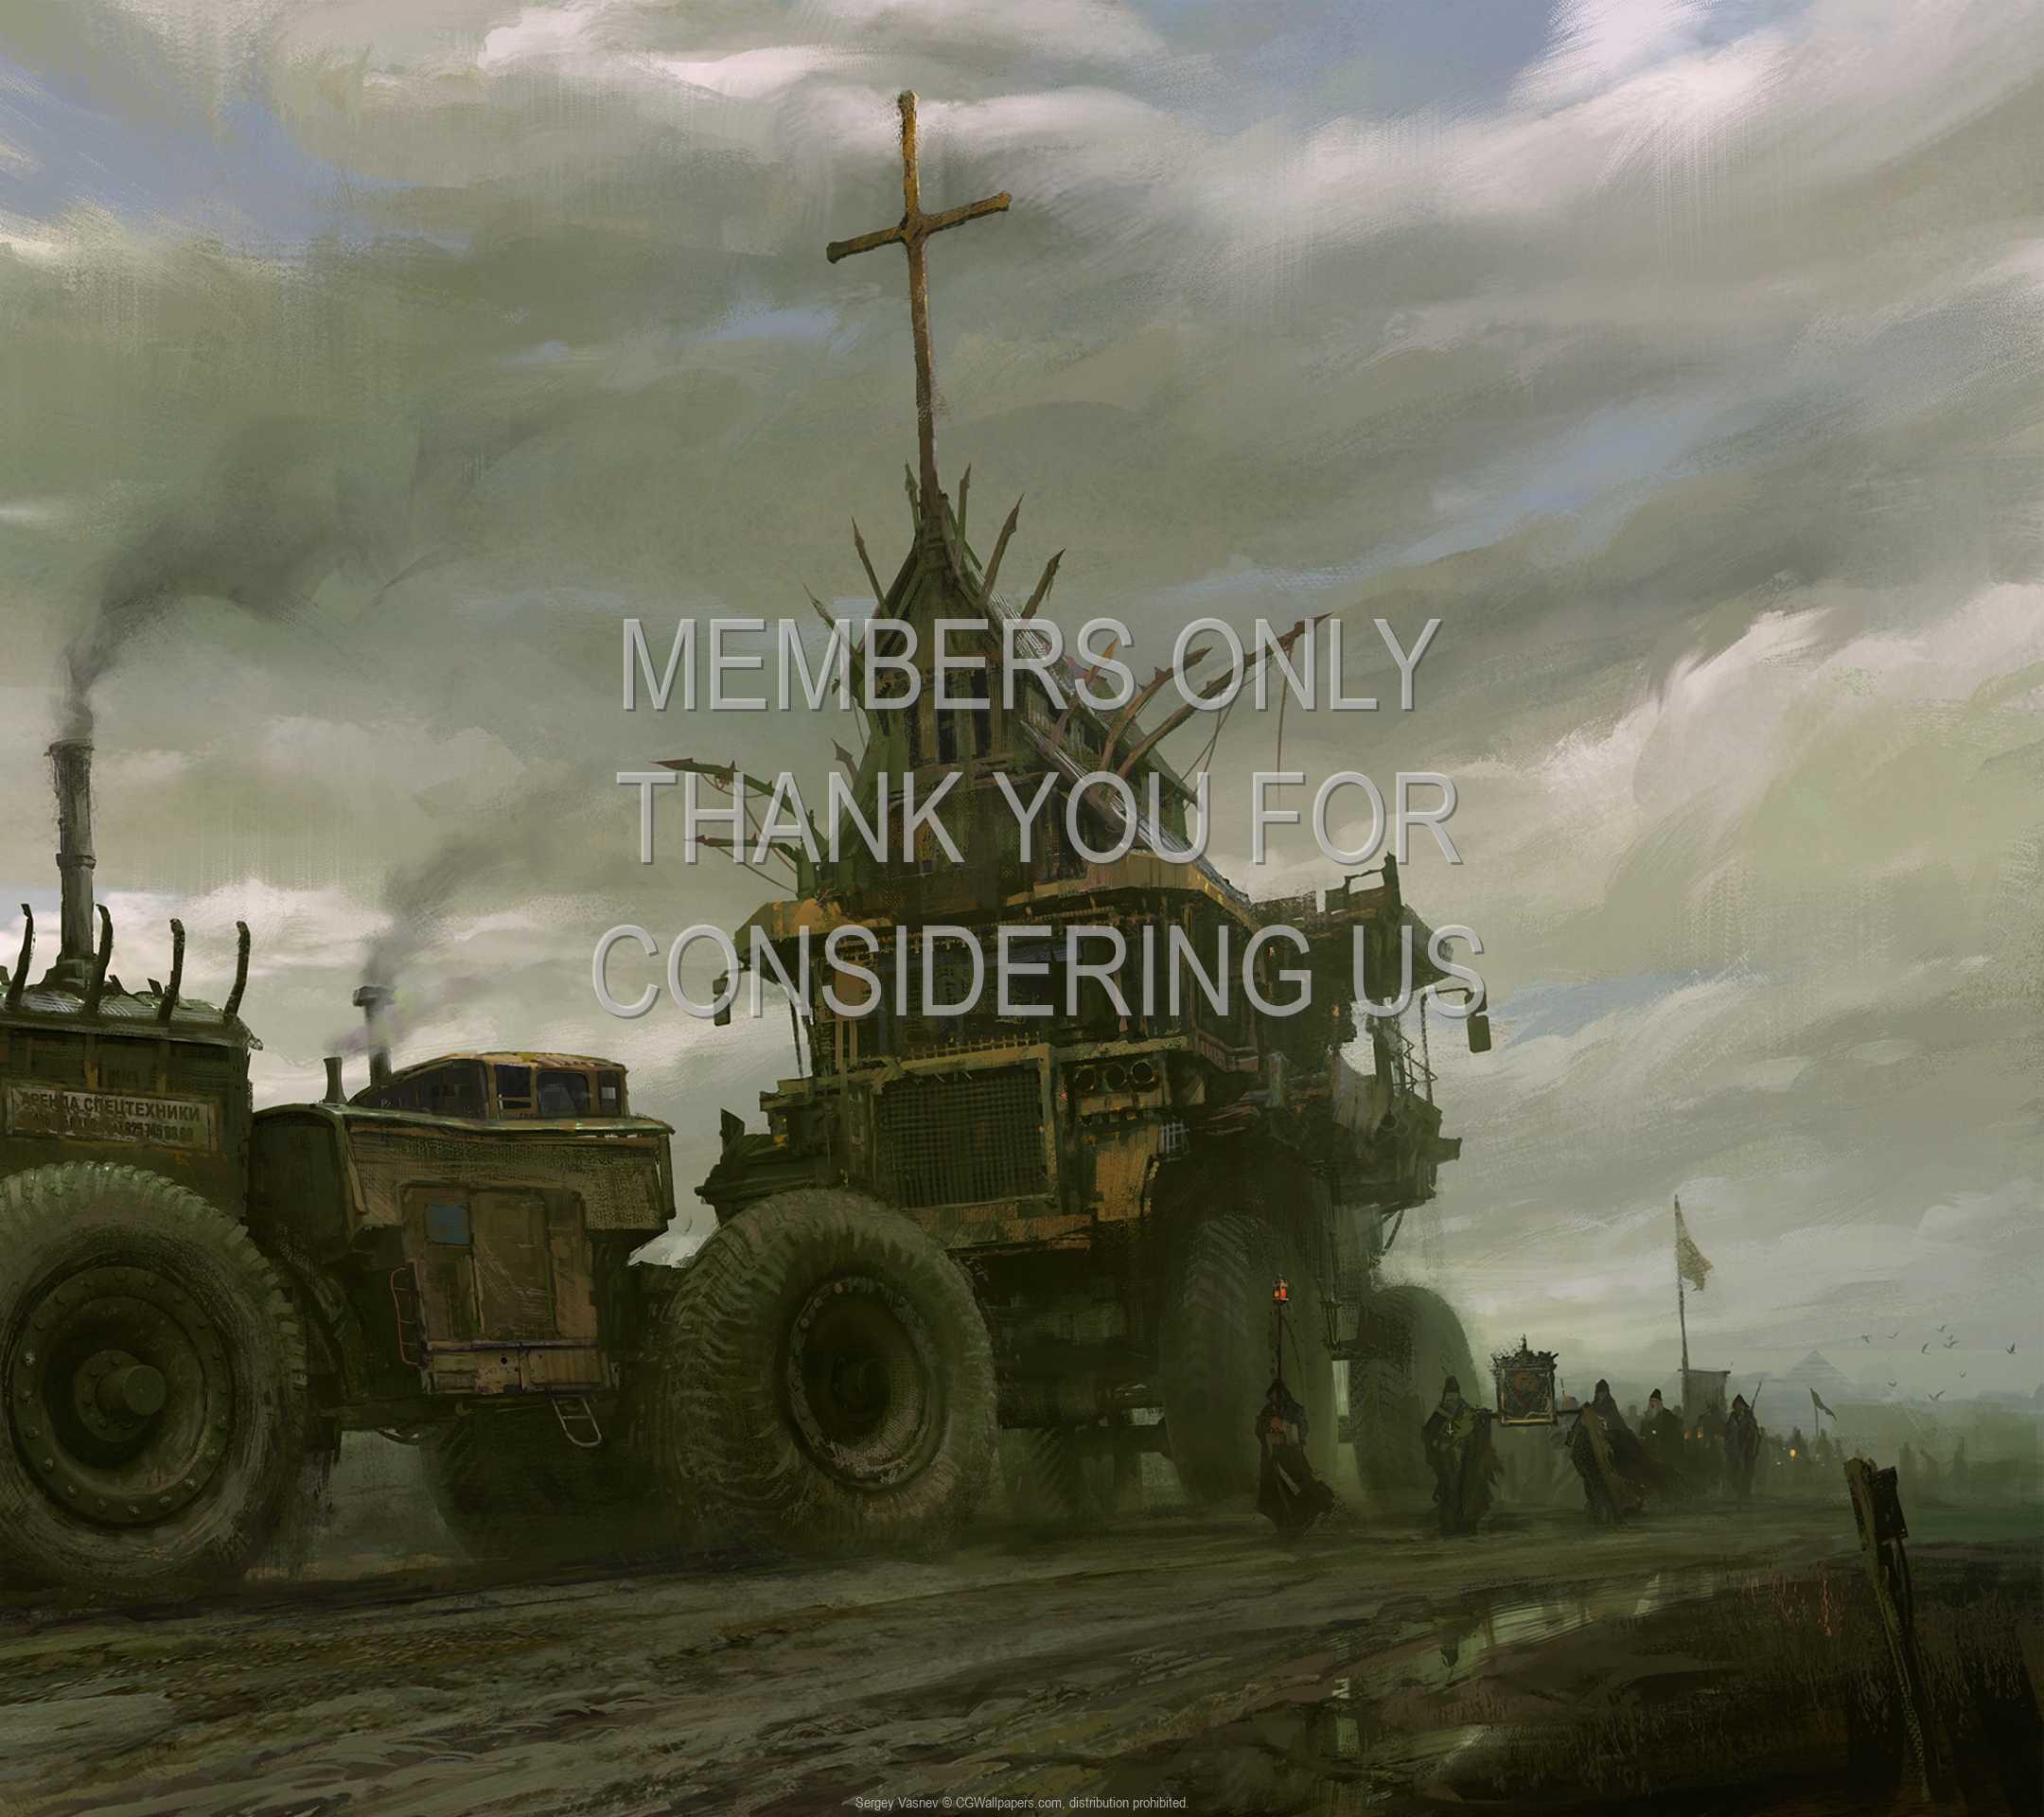 Sergey Vasnev 1080p Horizontal Mobile wallpaper or background 03